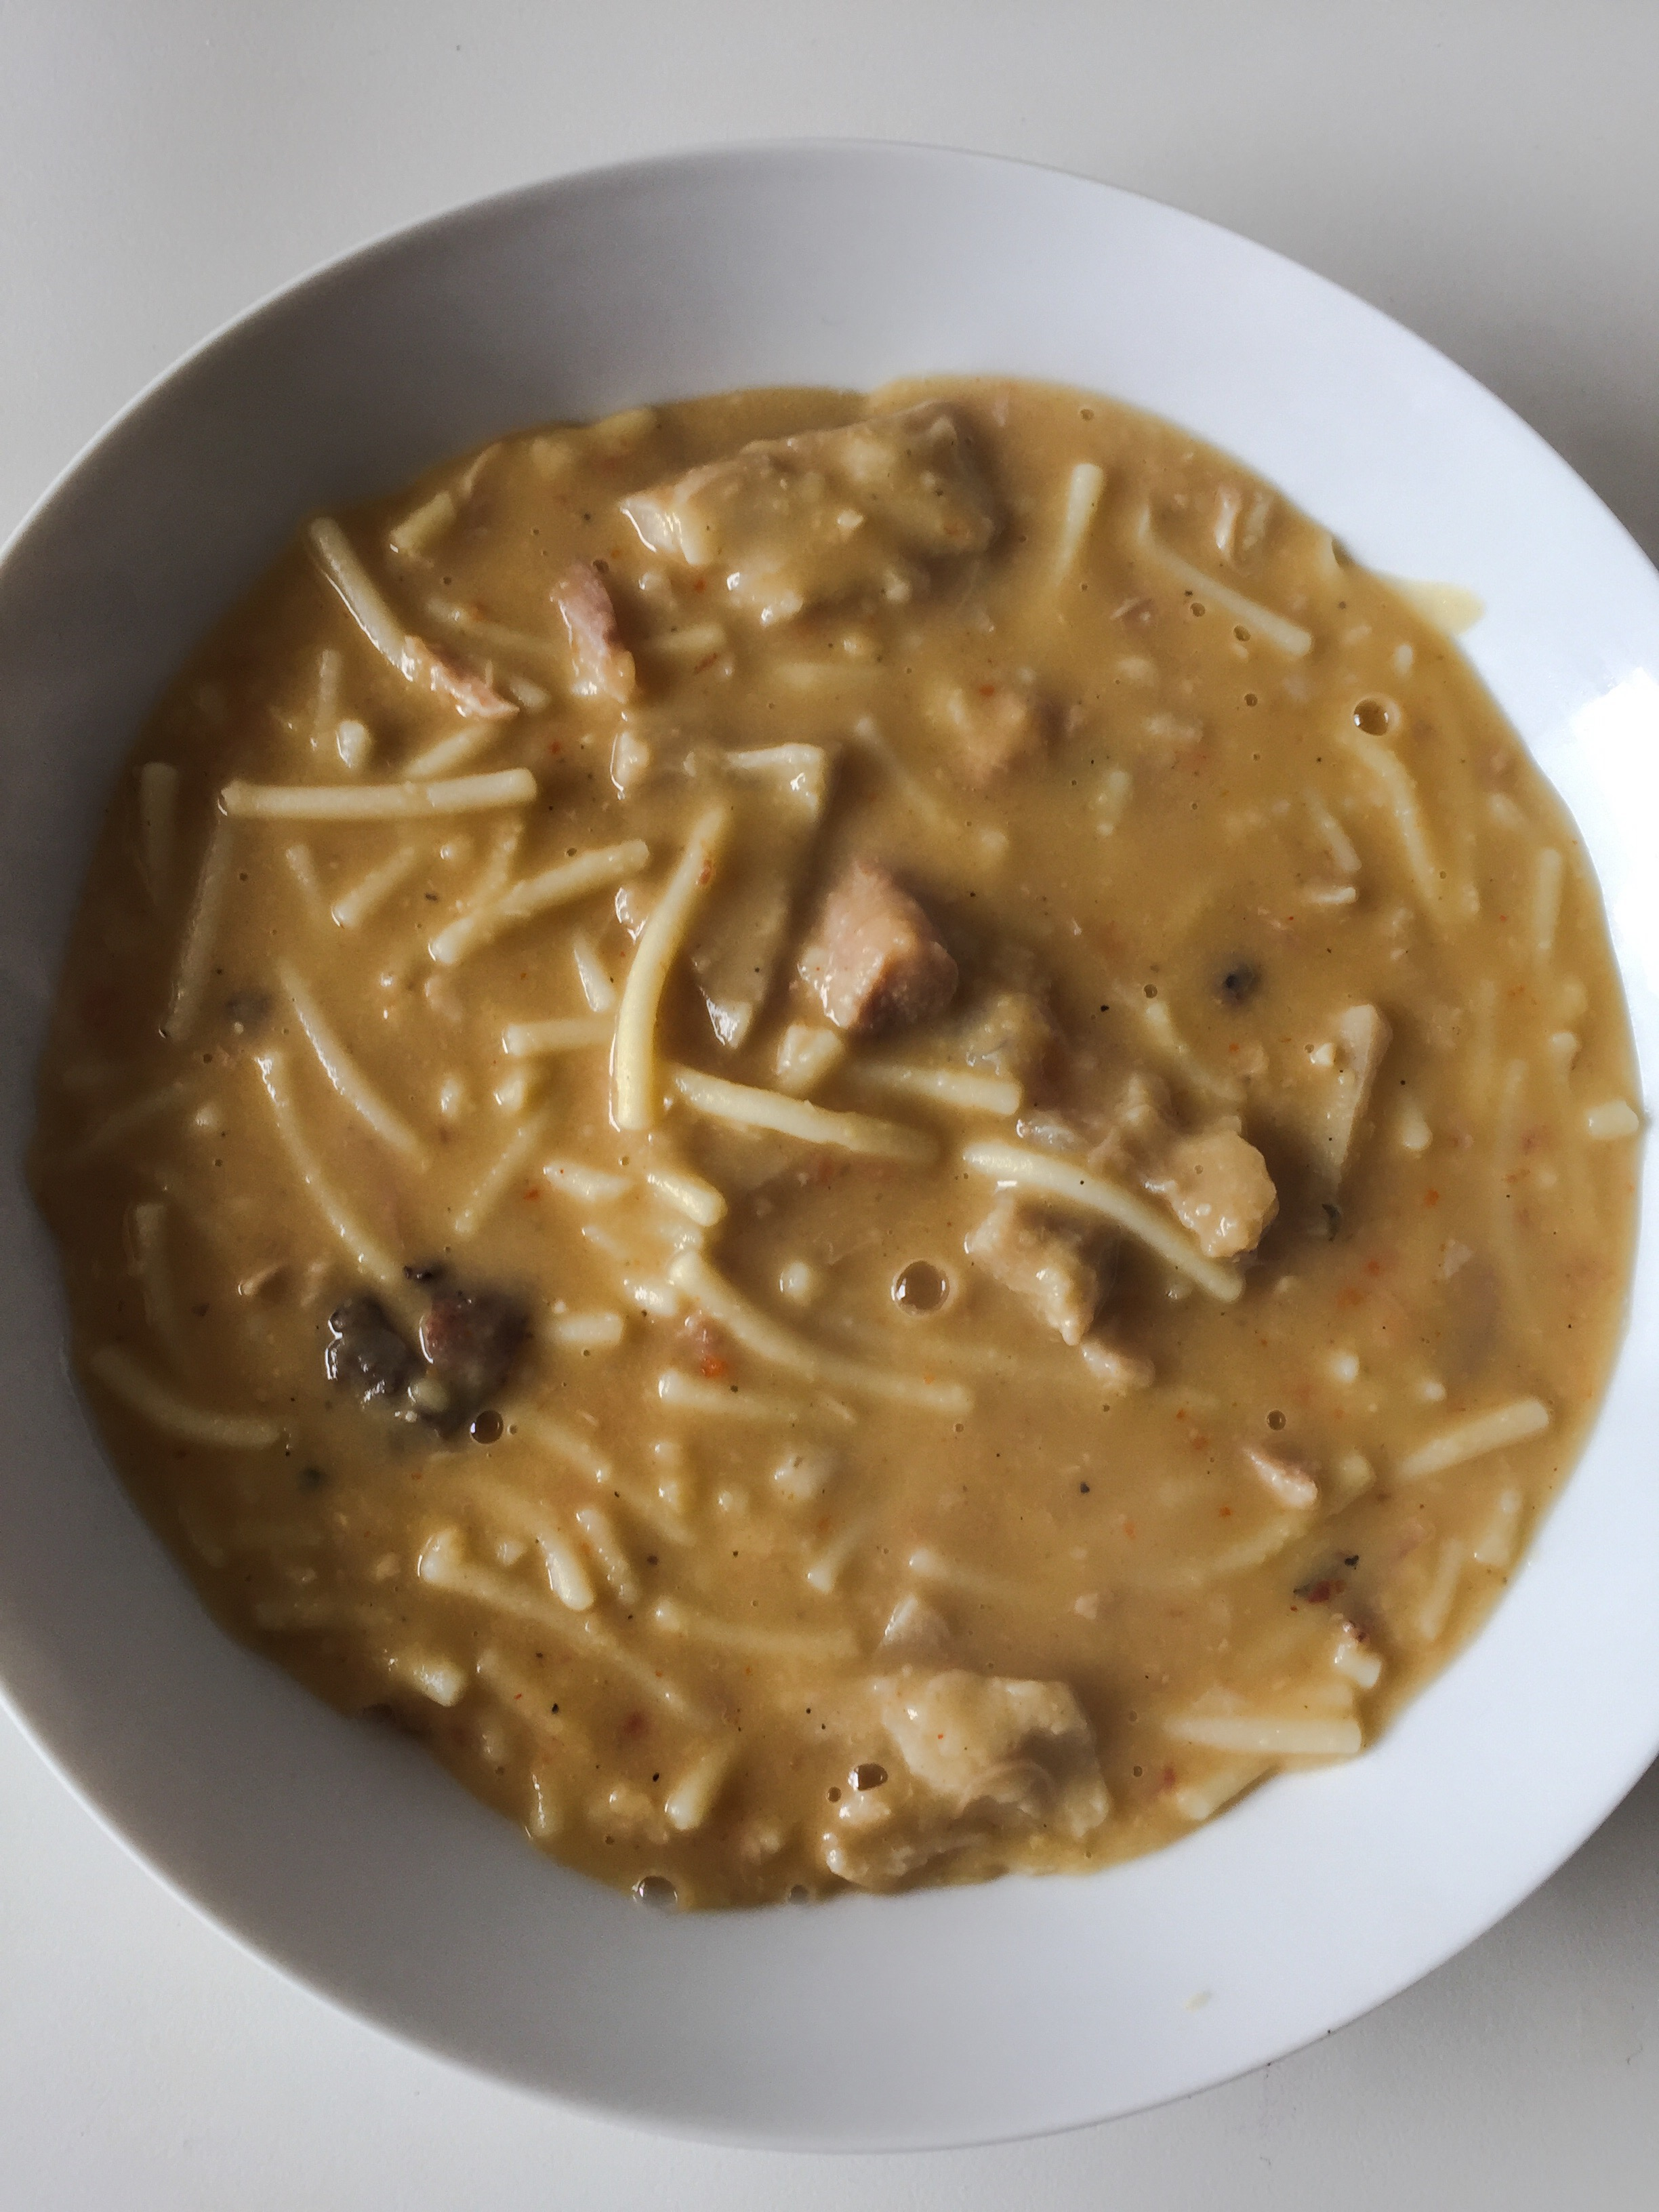 Cocina Mallorquina Recetas   Fava Parada Potaje De Habas Con Cerdo Recetas De Cocina